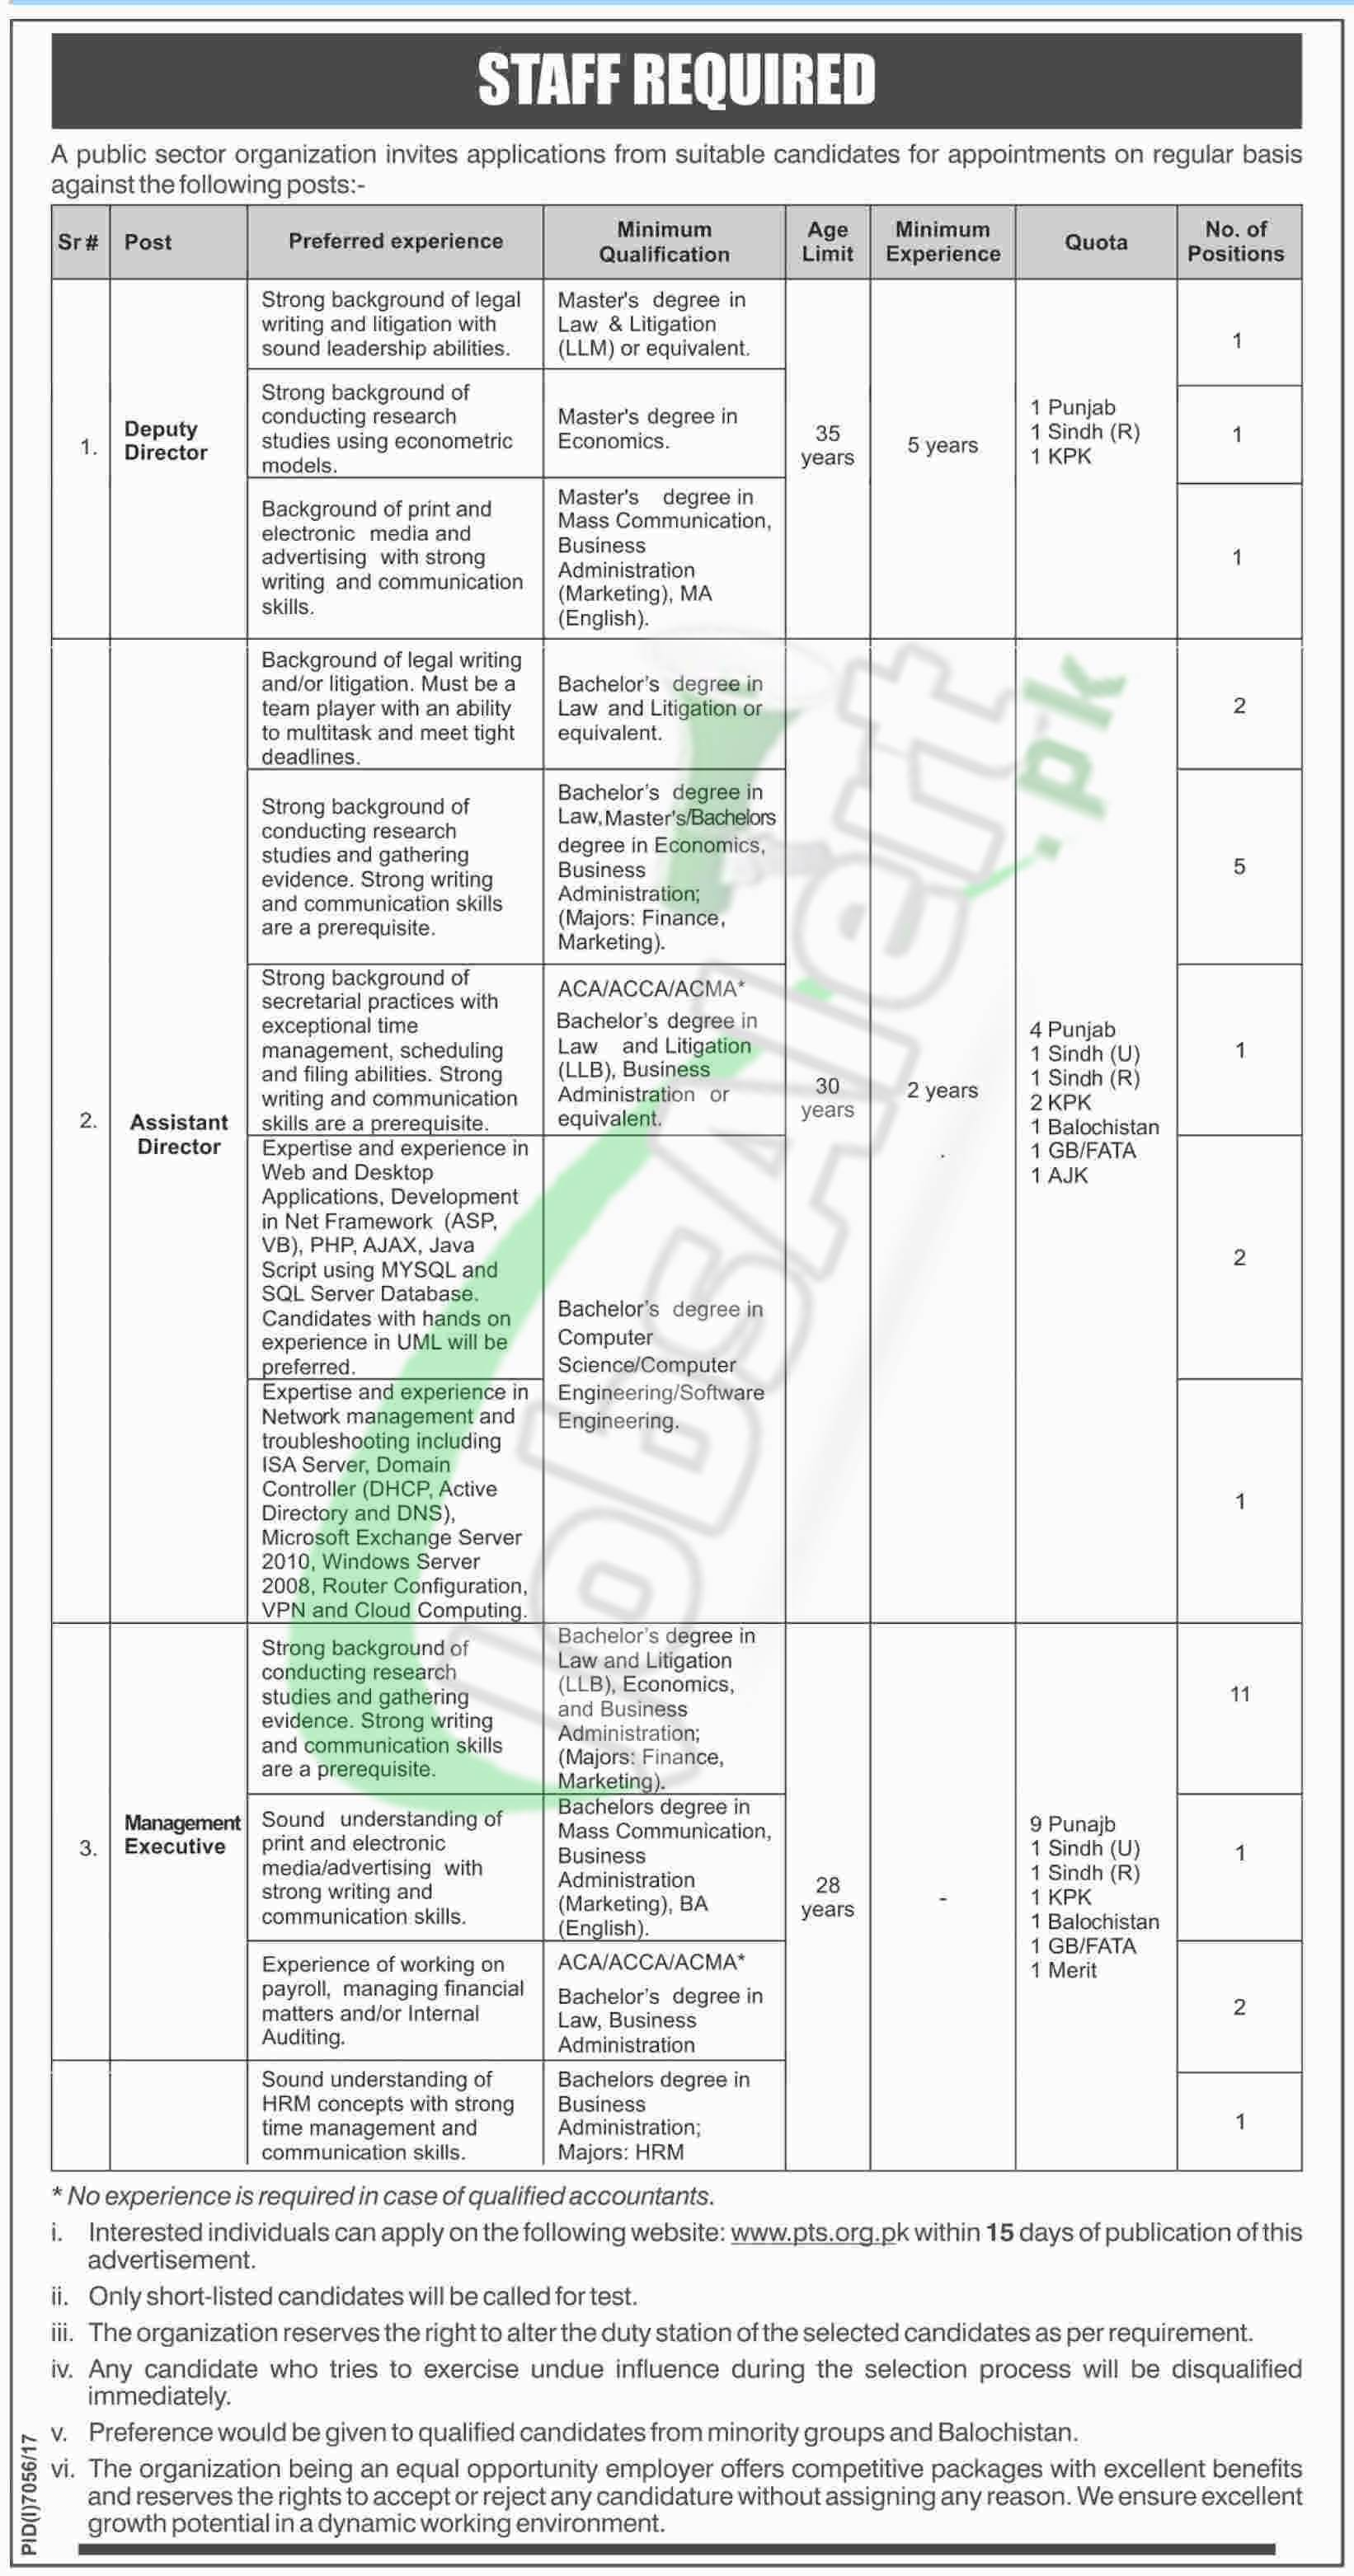 Public Sector Organization Jobs 2018